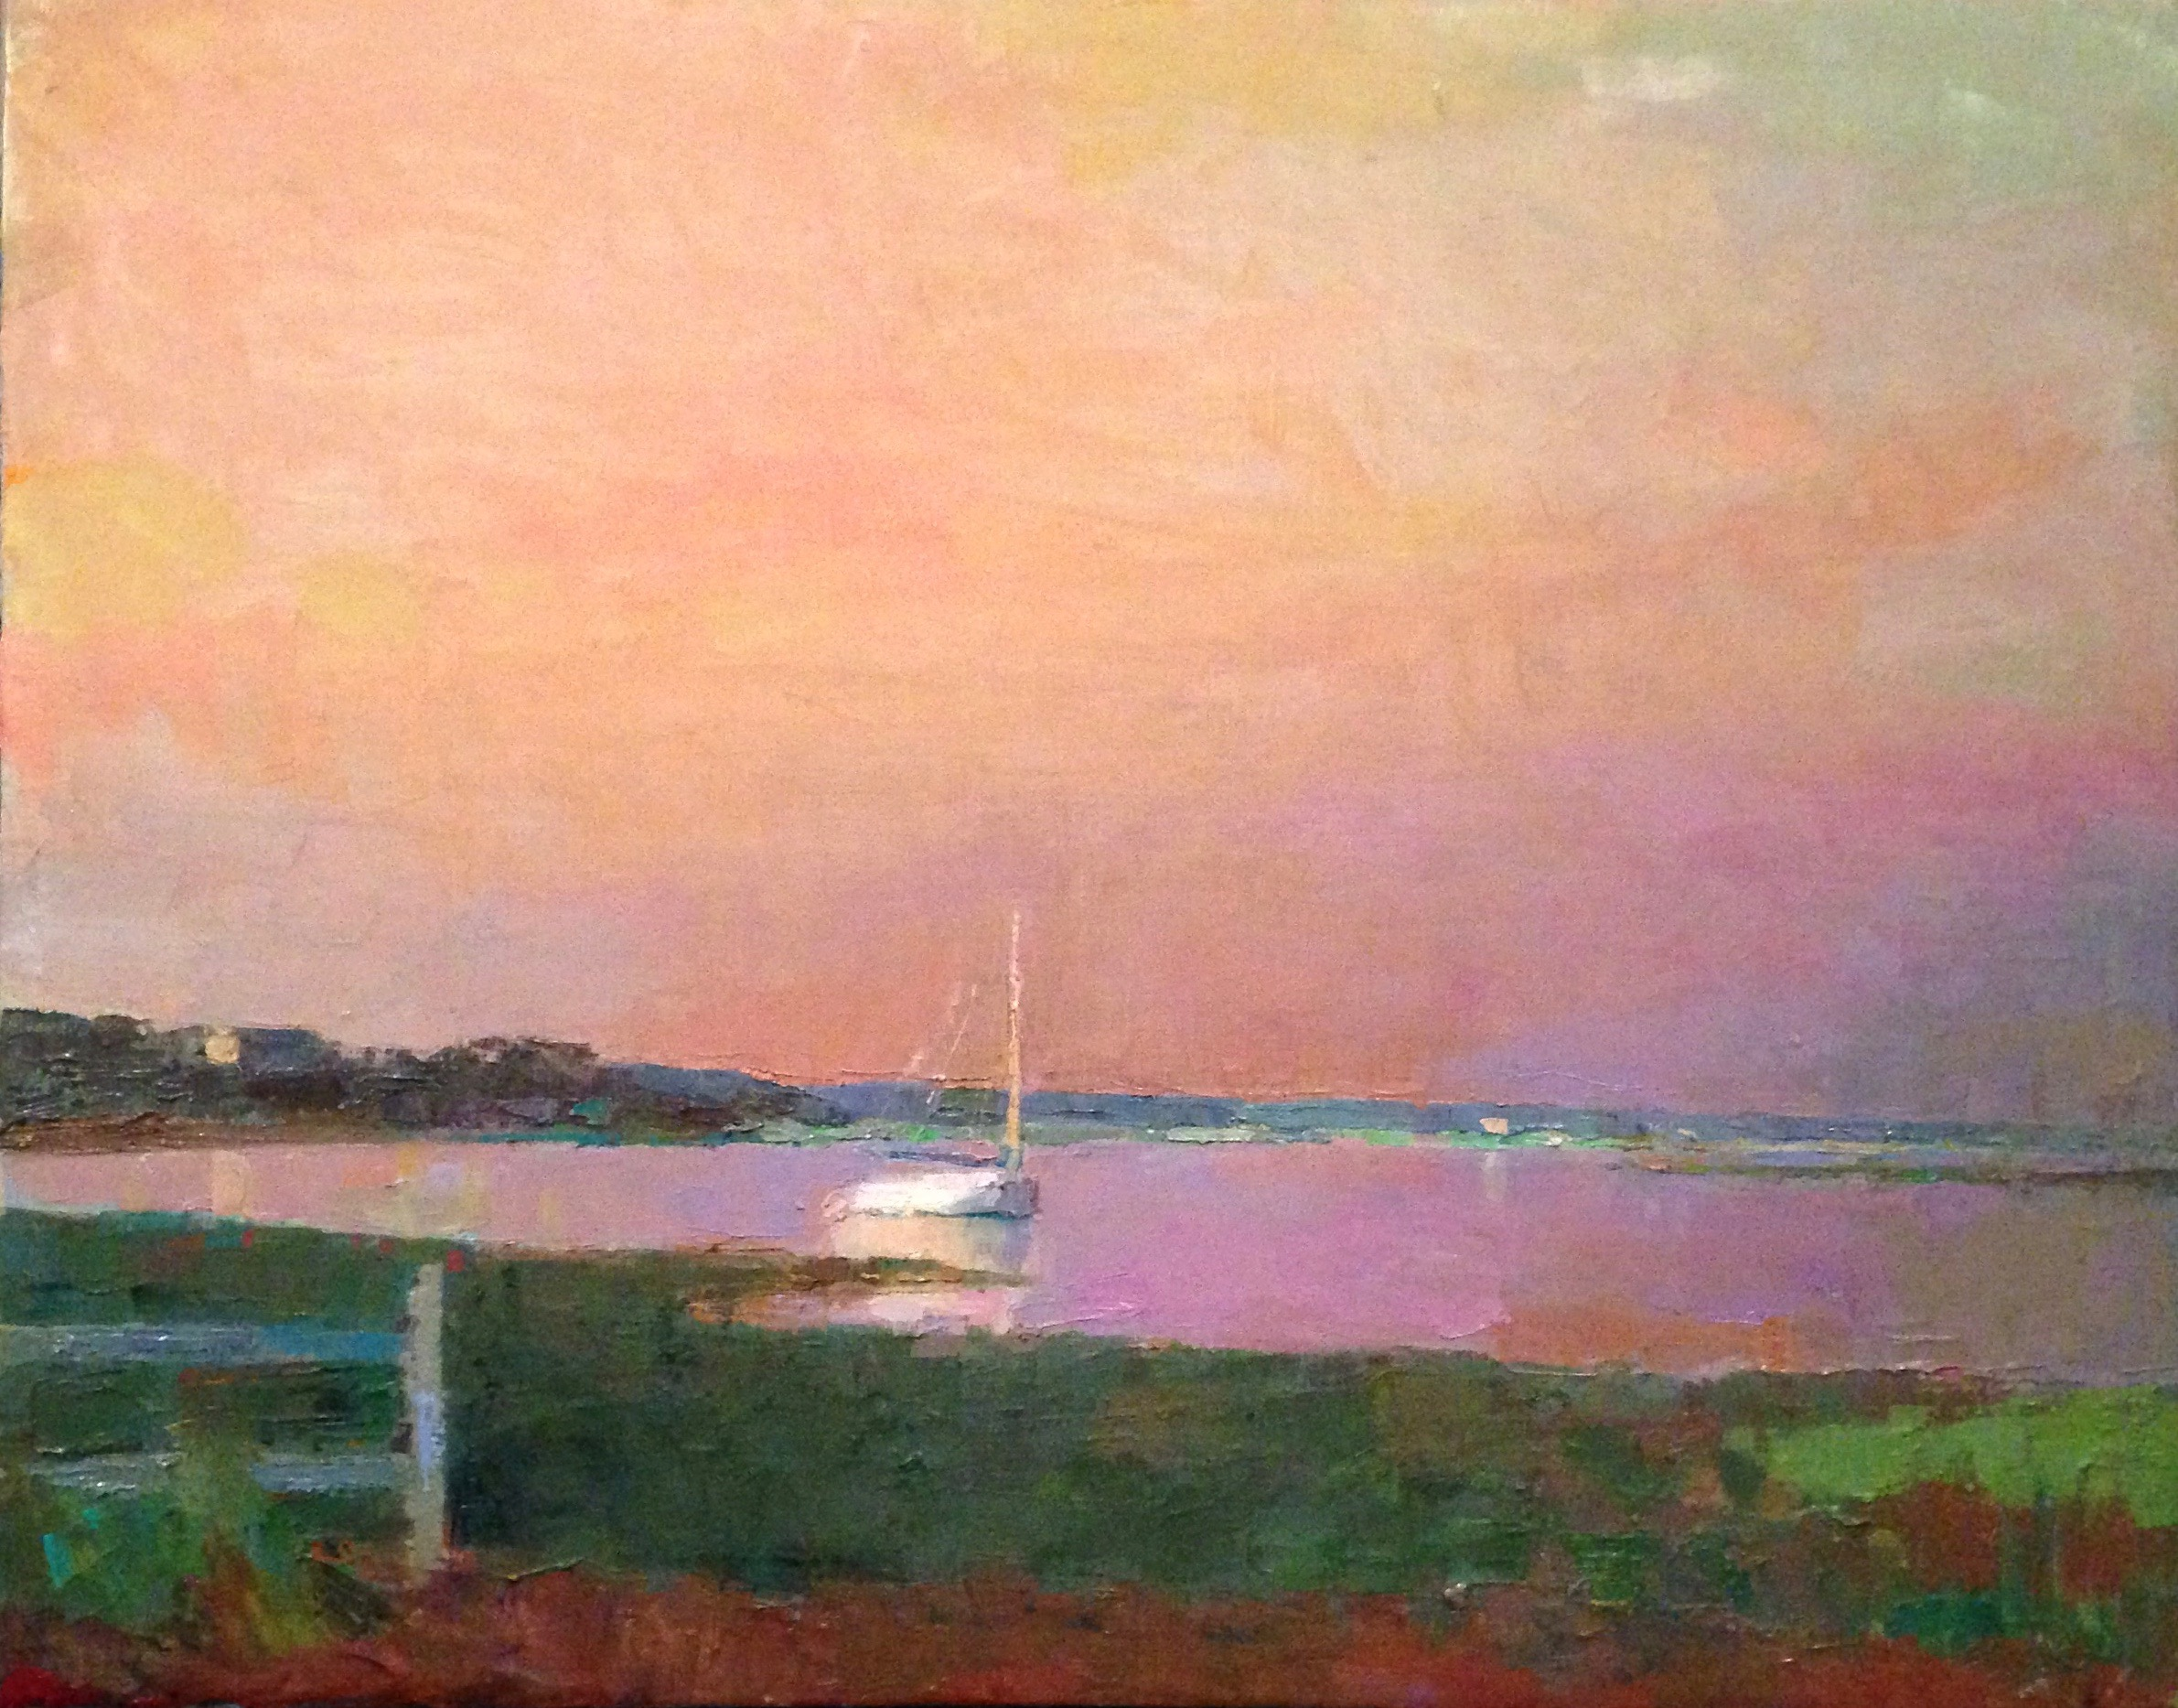 #6851 Catboat Sunrise 22x28 Oil studio copy.jpg